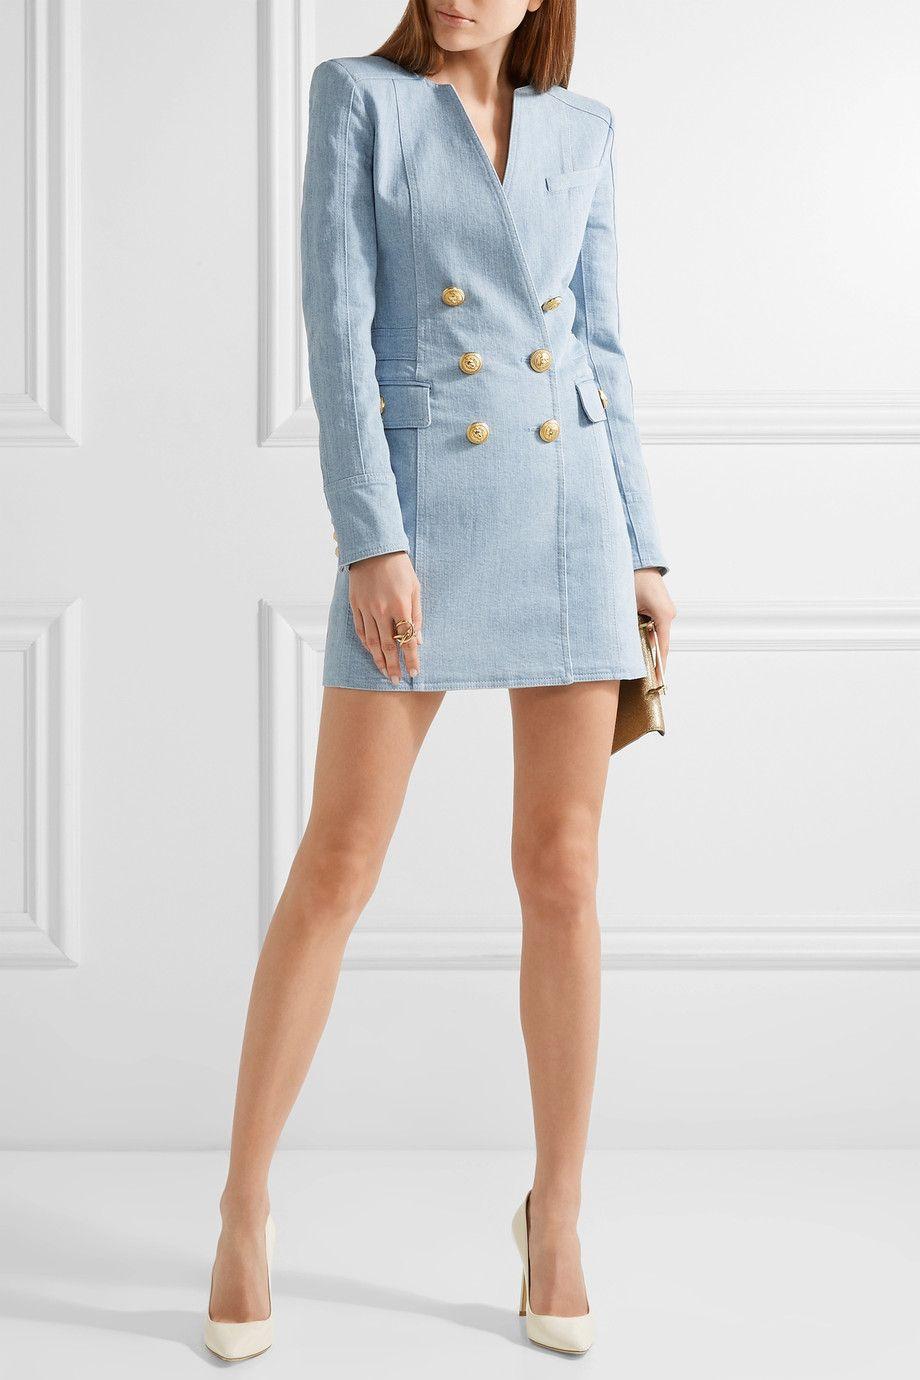 reputable site innovative design finest selection Balmain - Double-breasted denim mini dress   Luxury brands ...